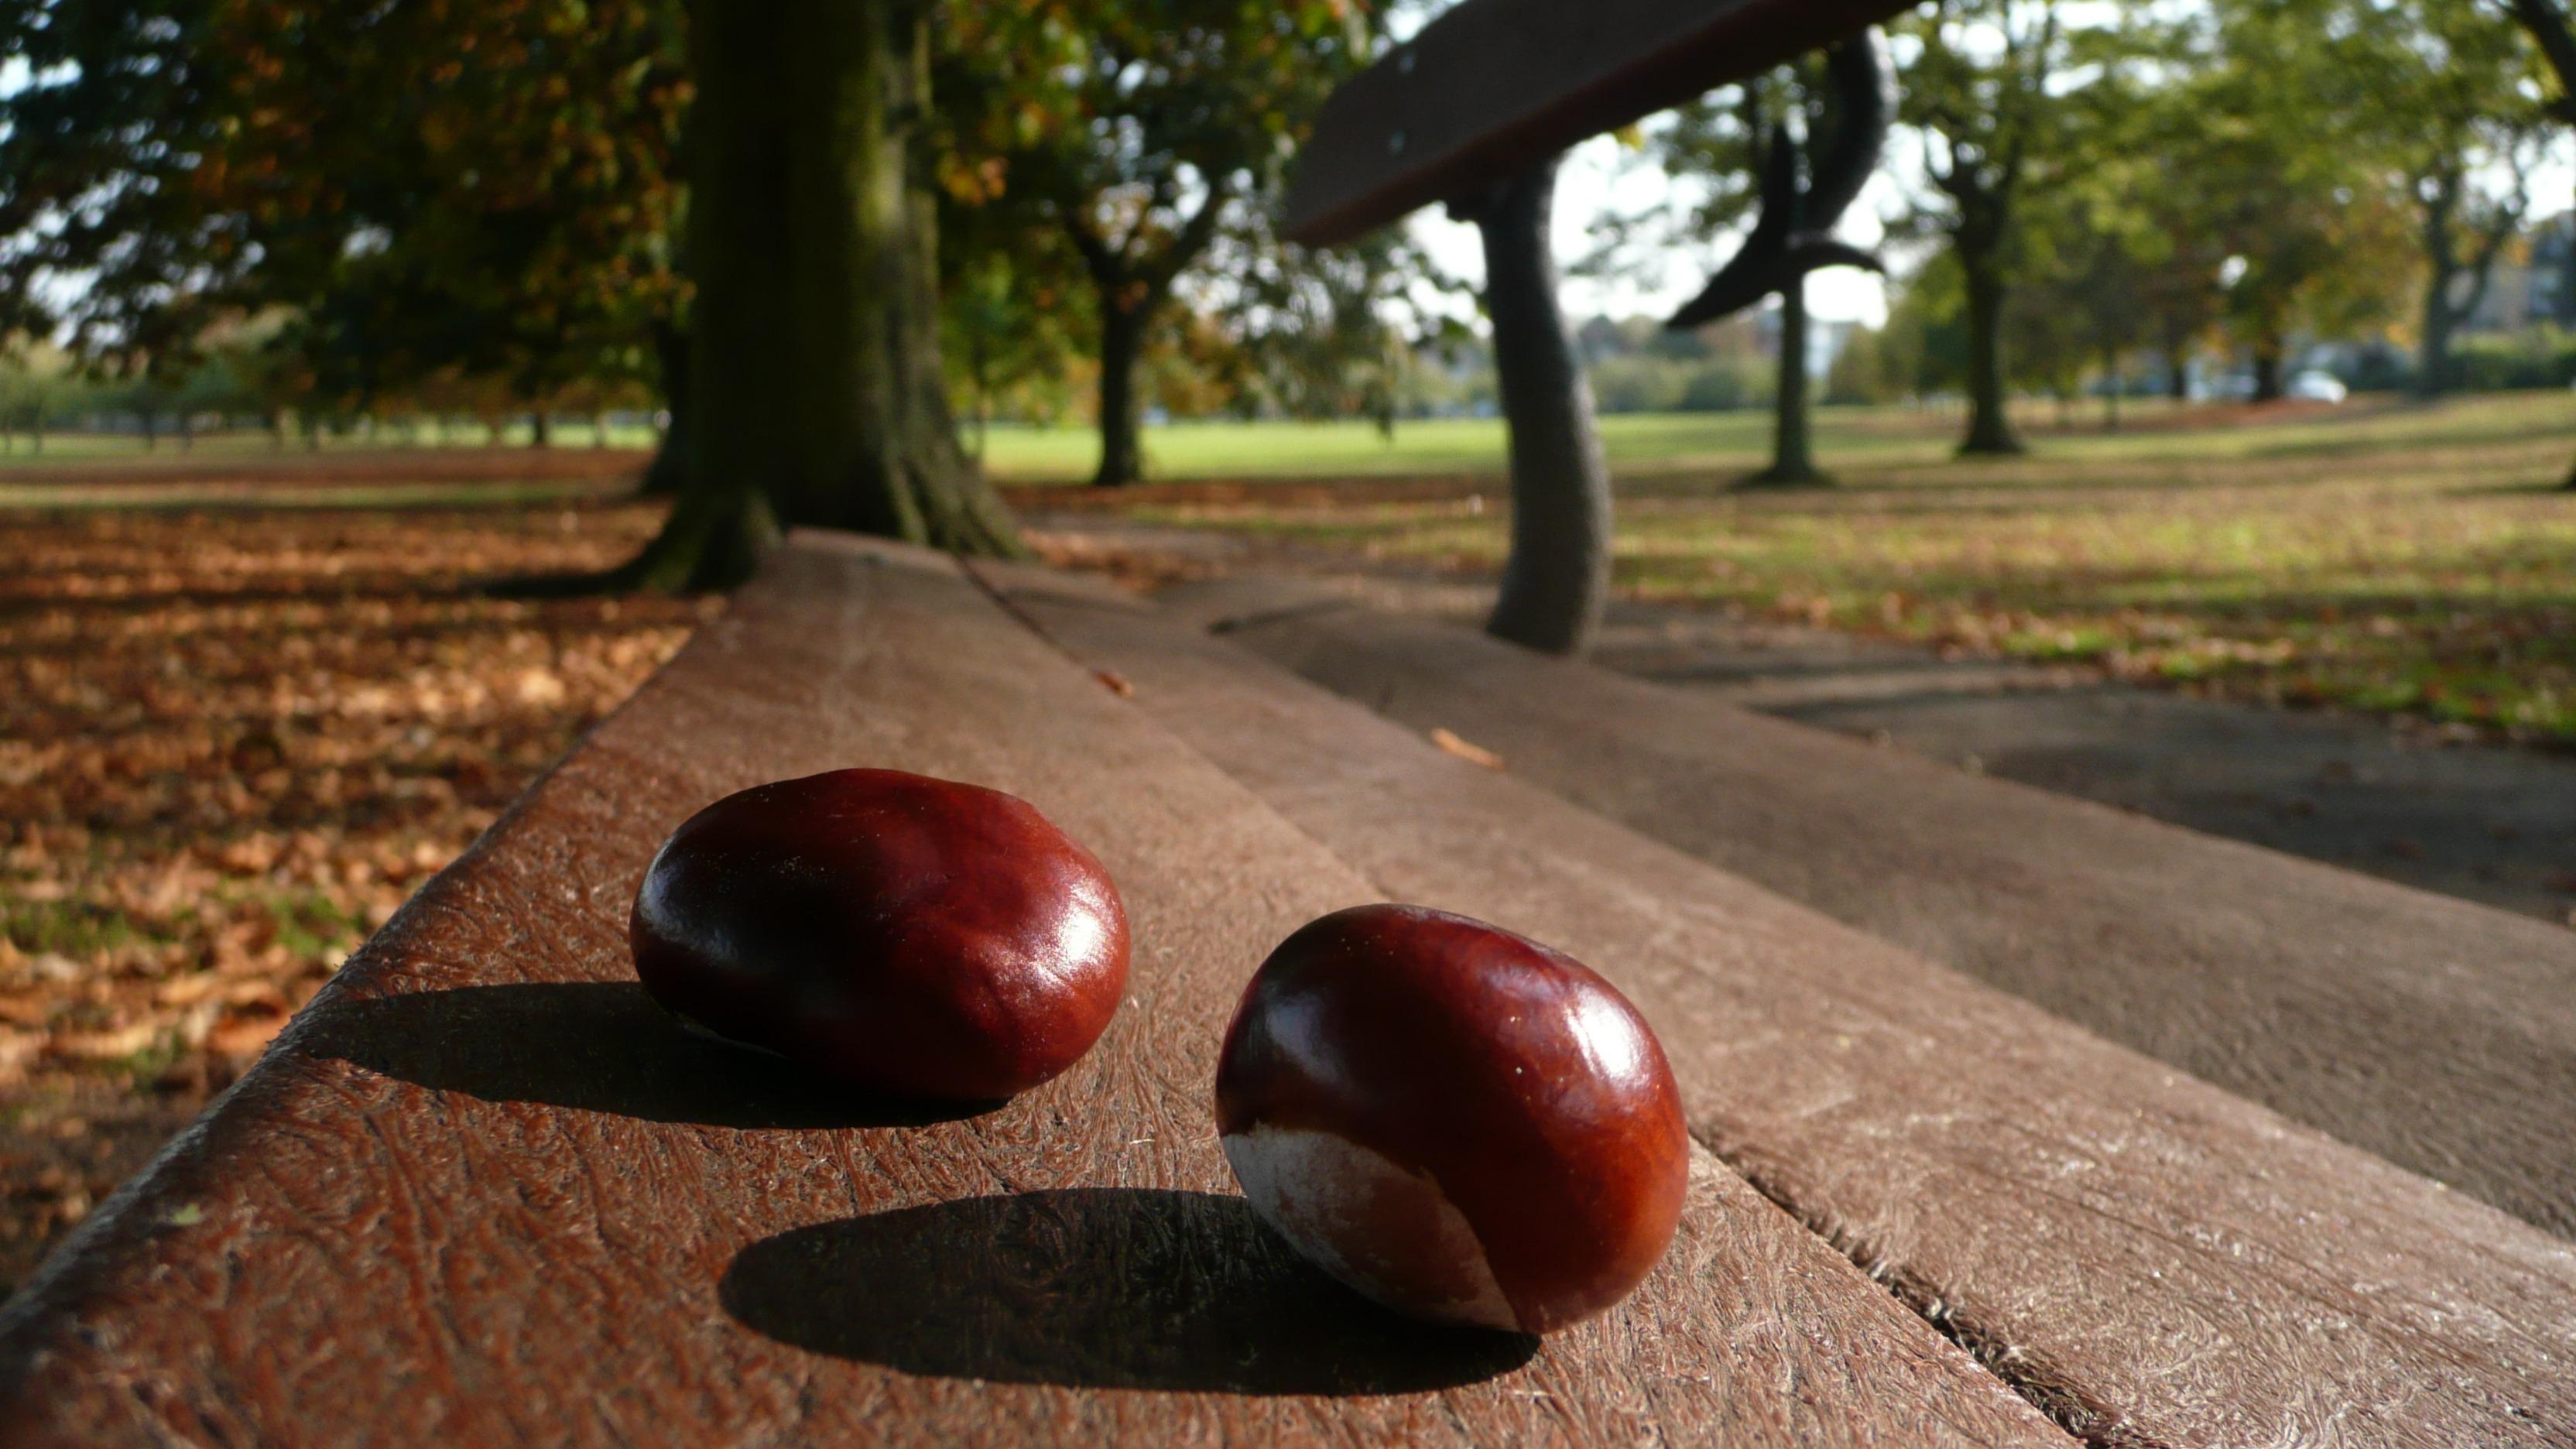 free images tree nature bench fruit leaf food produce